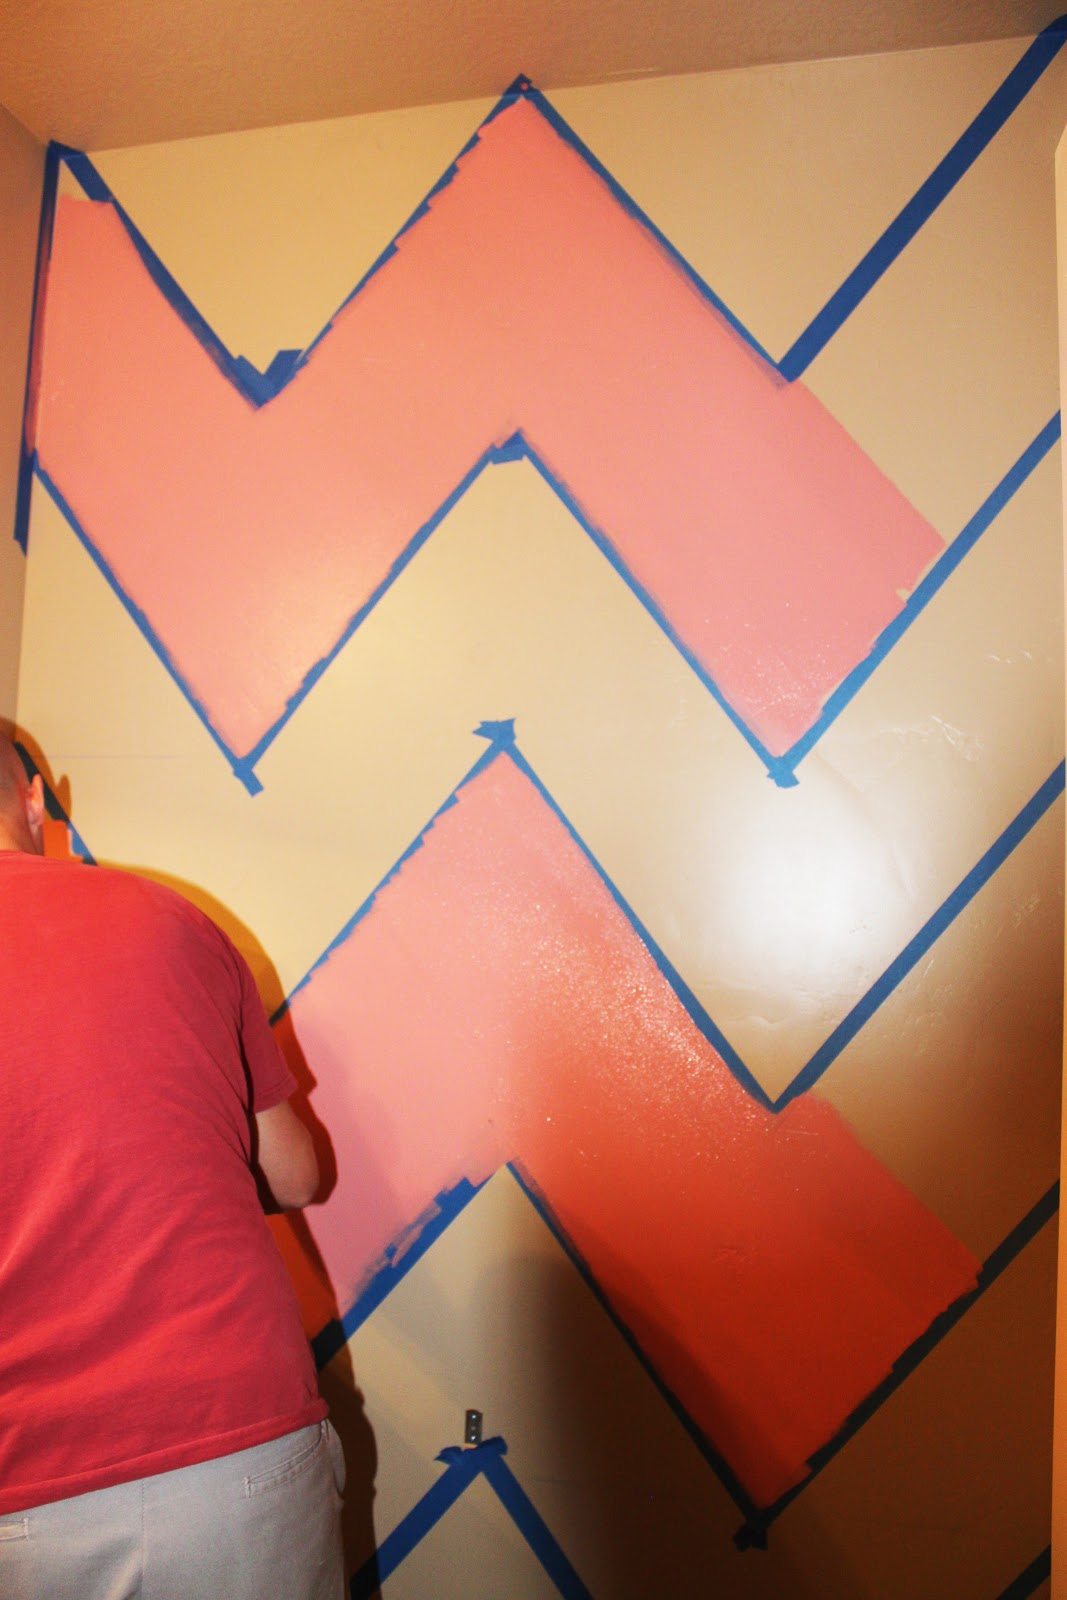 diy chevron bathroom wall dani marie blog diy chevron bathroom wall